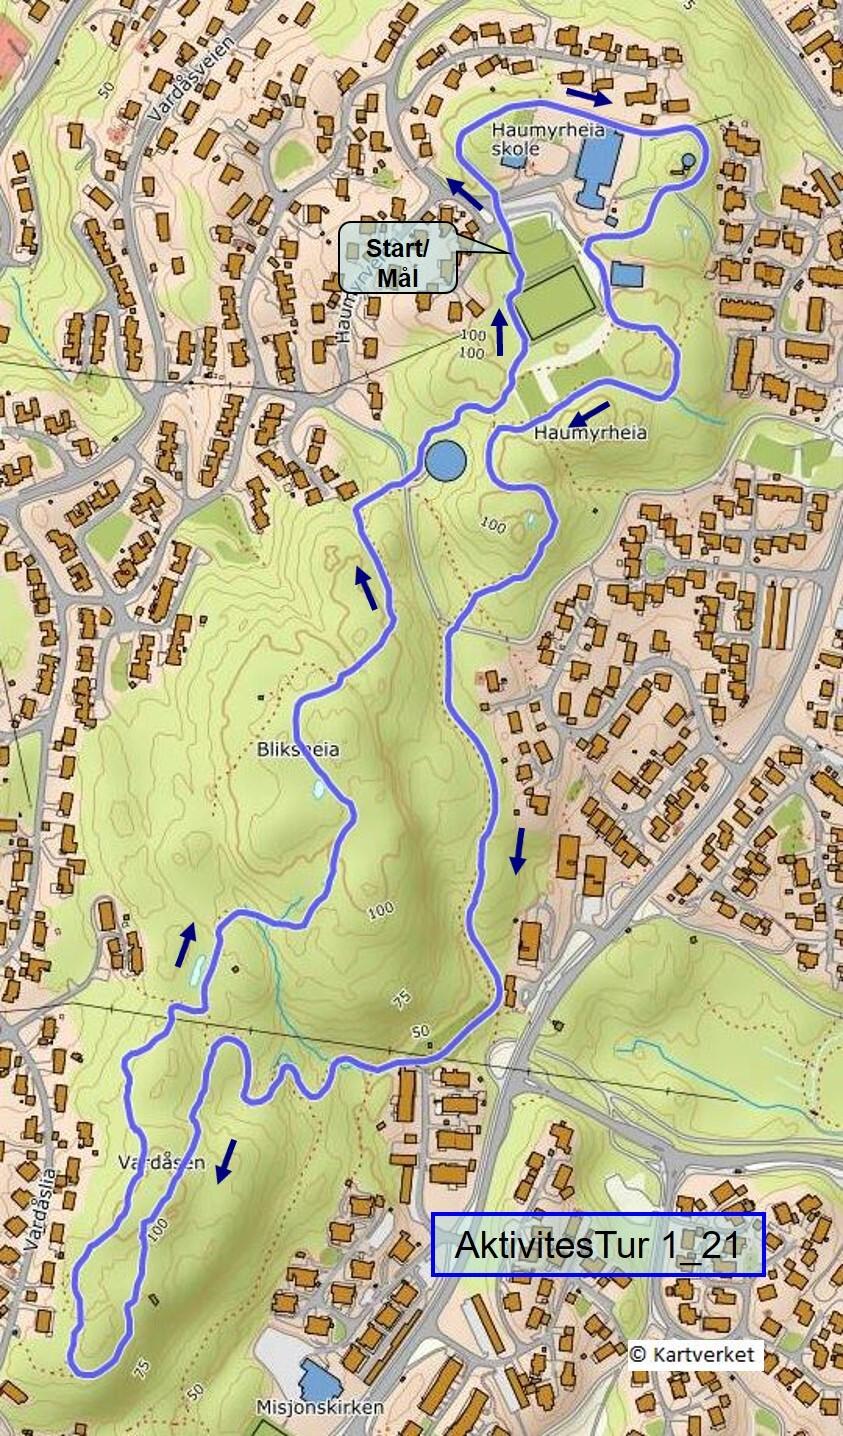 Kart_AktivitetsTur_1-2021.jpg